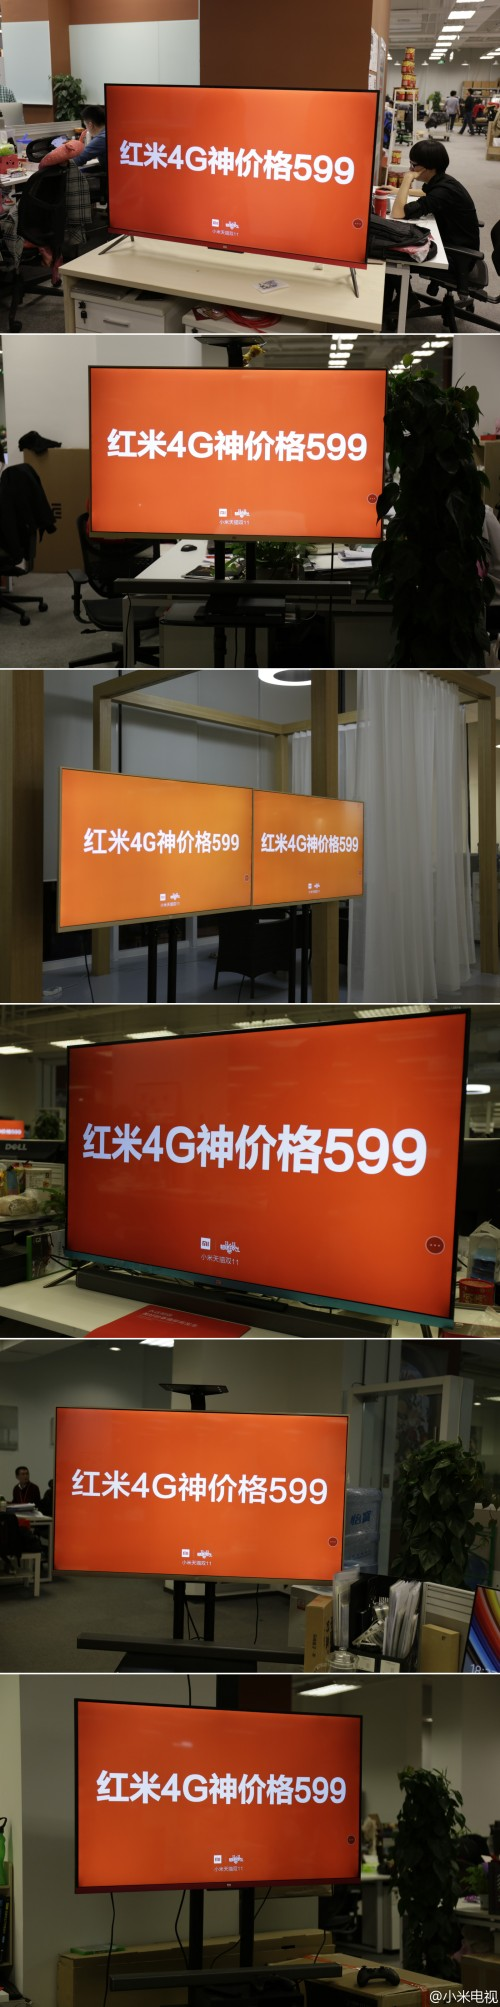 Xiaomi1111Reminder